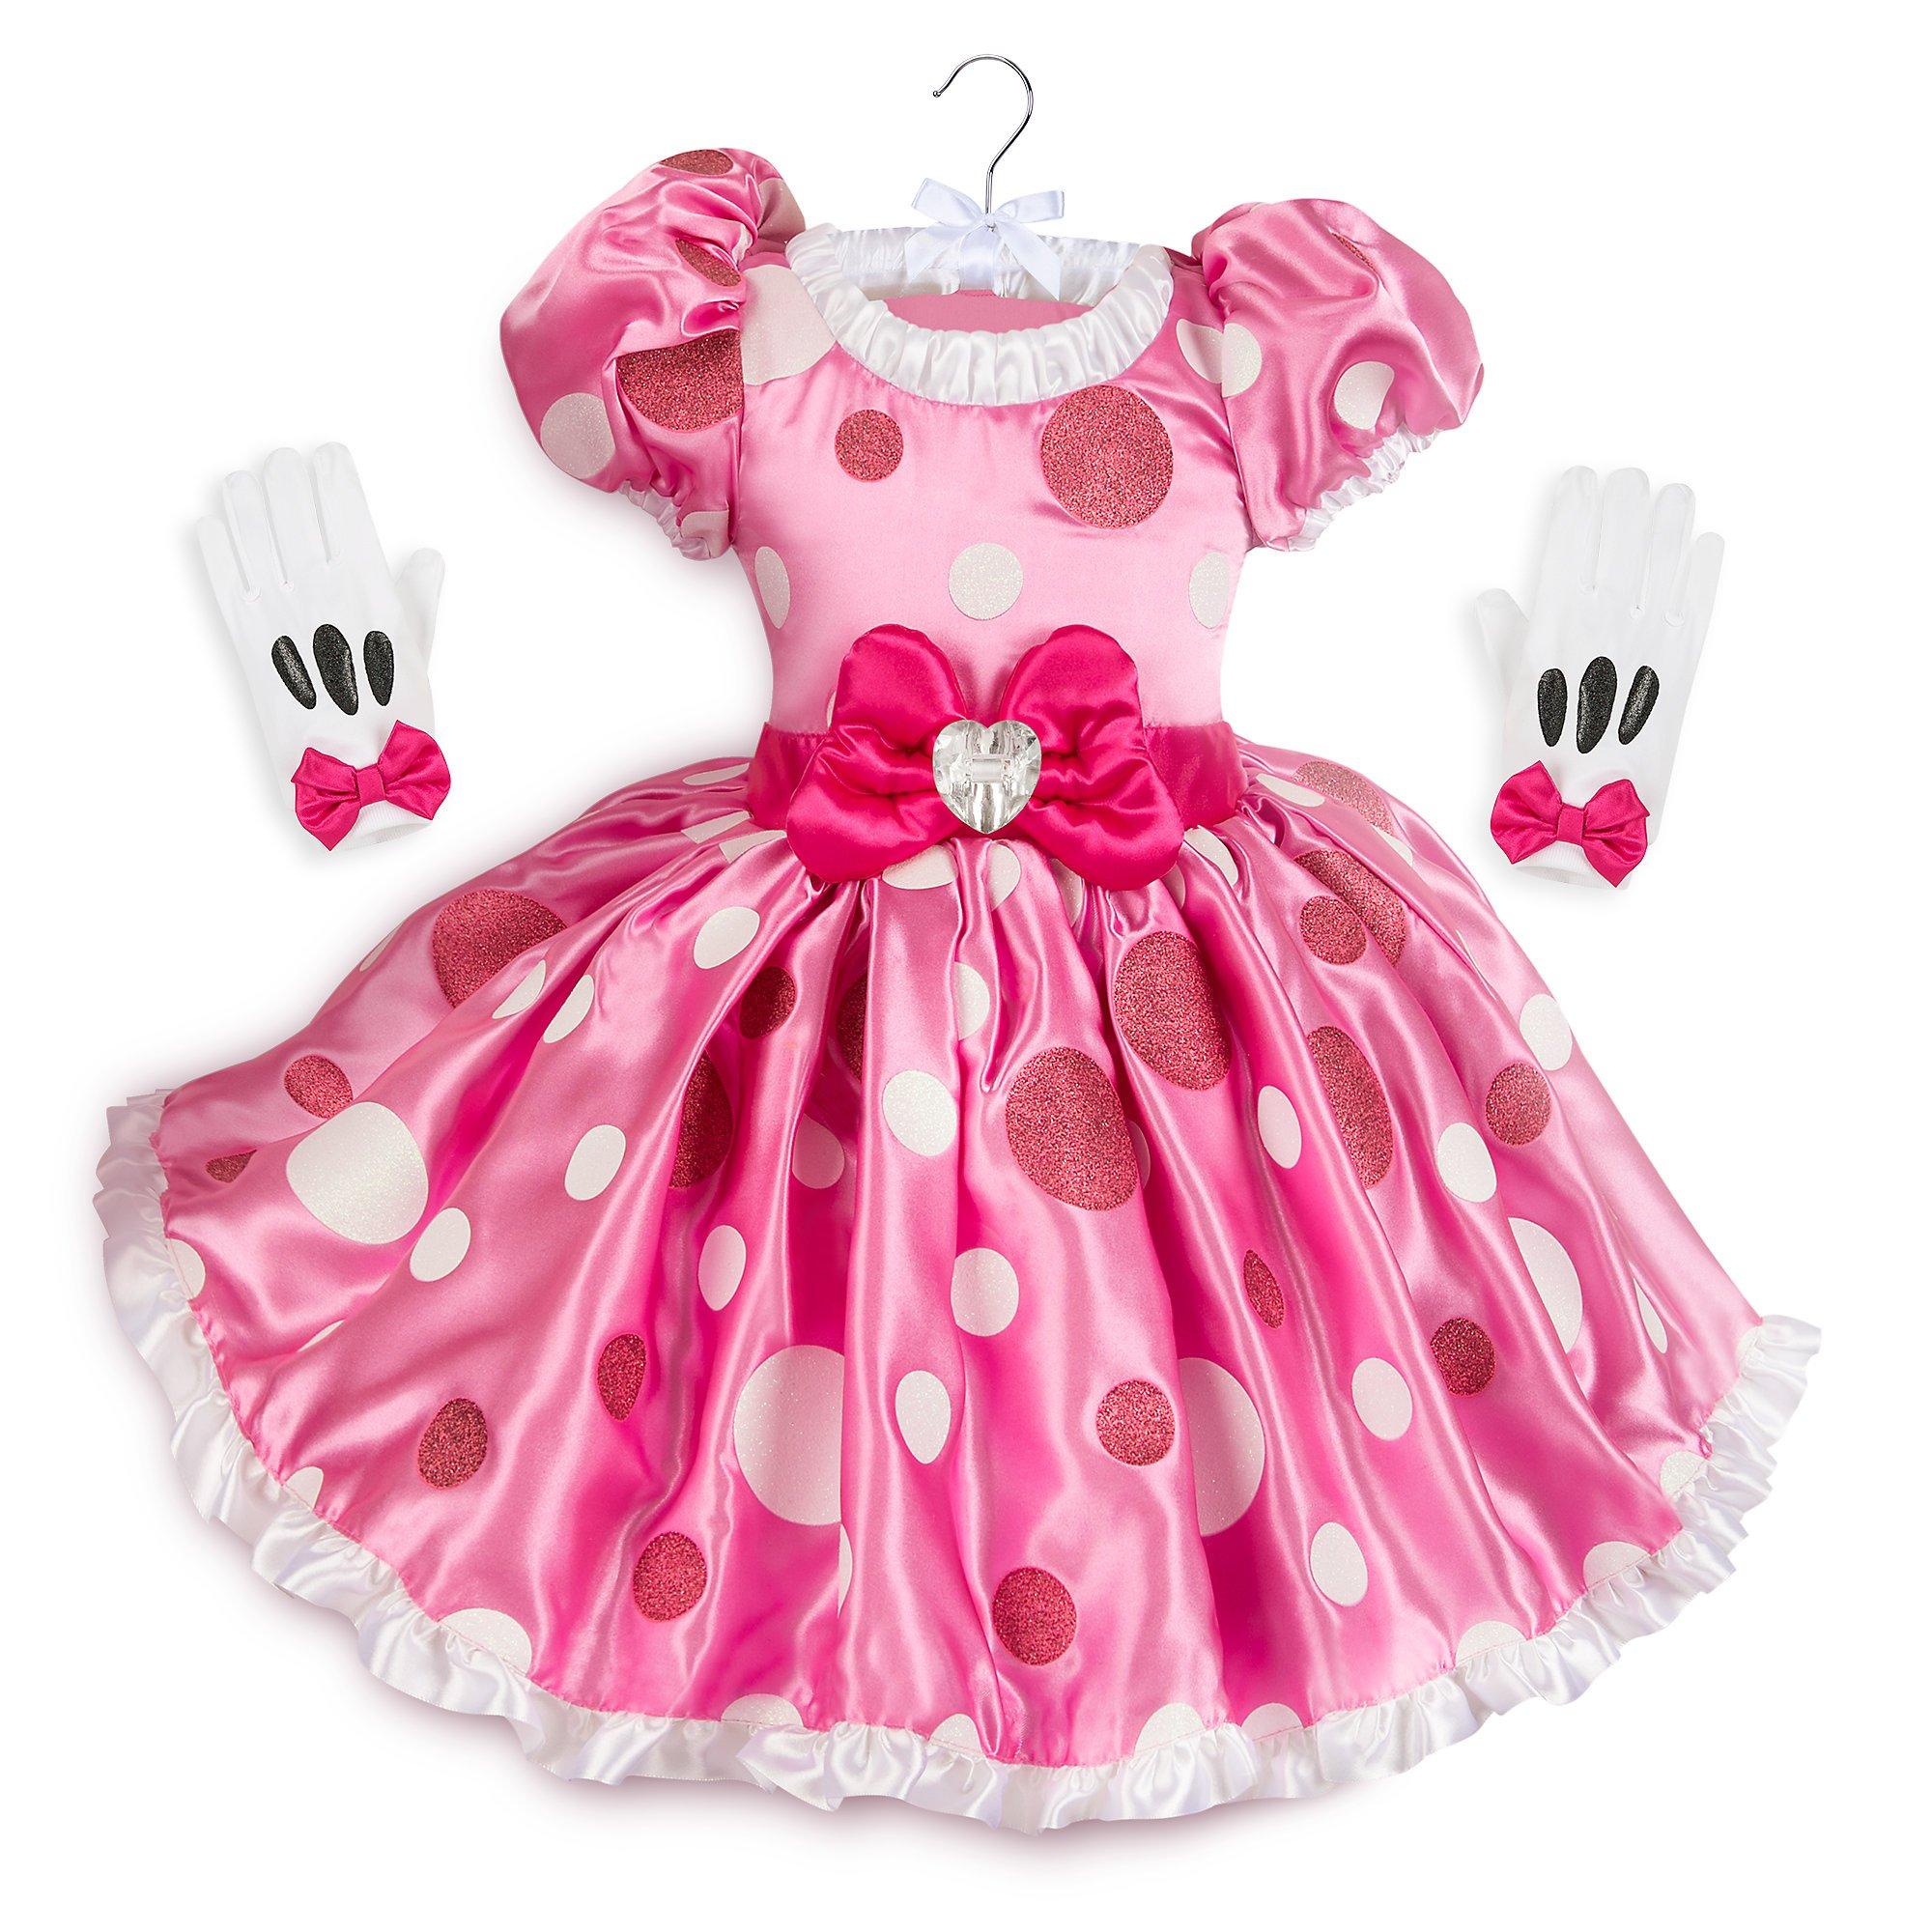 Disney Minnie Mouse Pink Dress Costume Kids Size 5/6 Pink